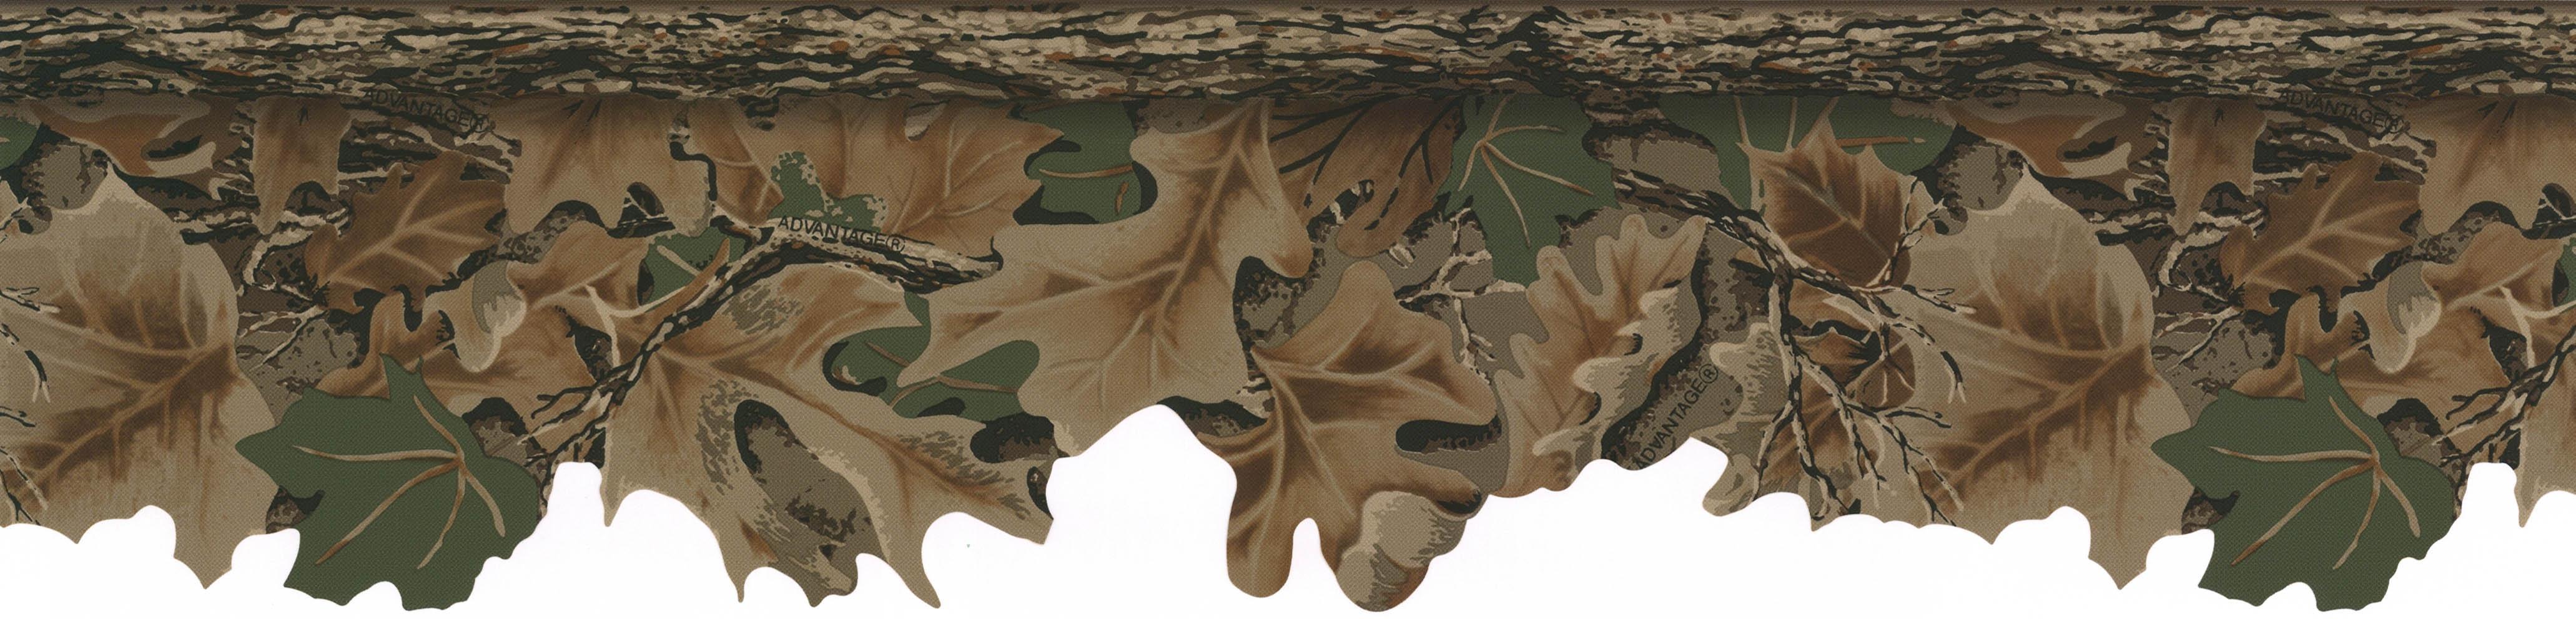 Hd camo wallpaper with deer heads free wallpaper for Camo wallpaper for walls